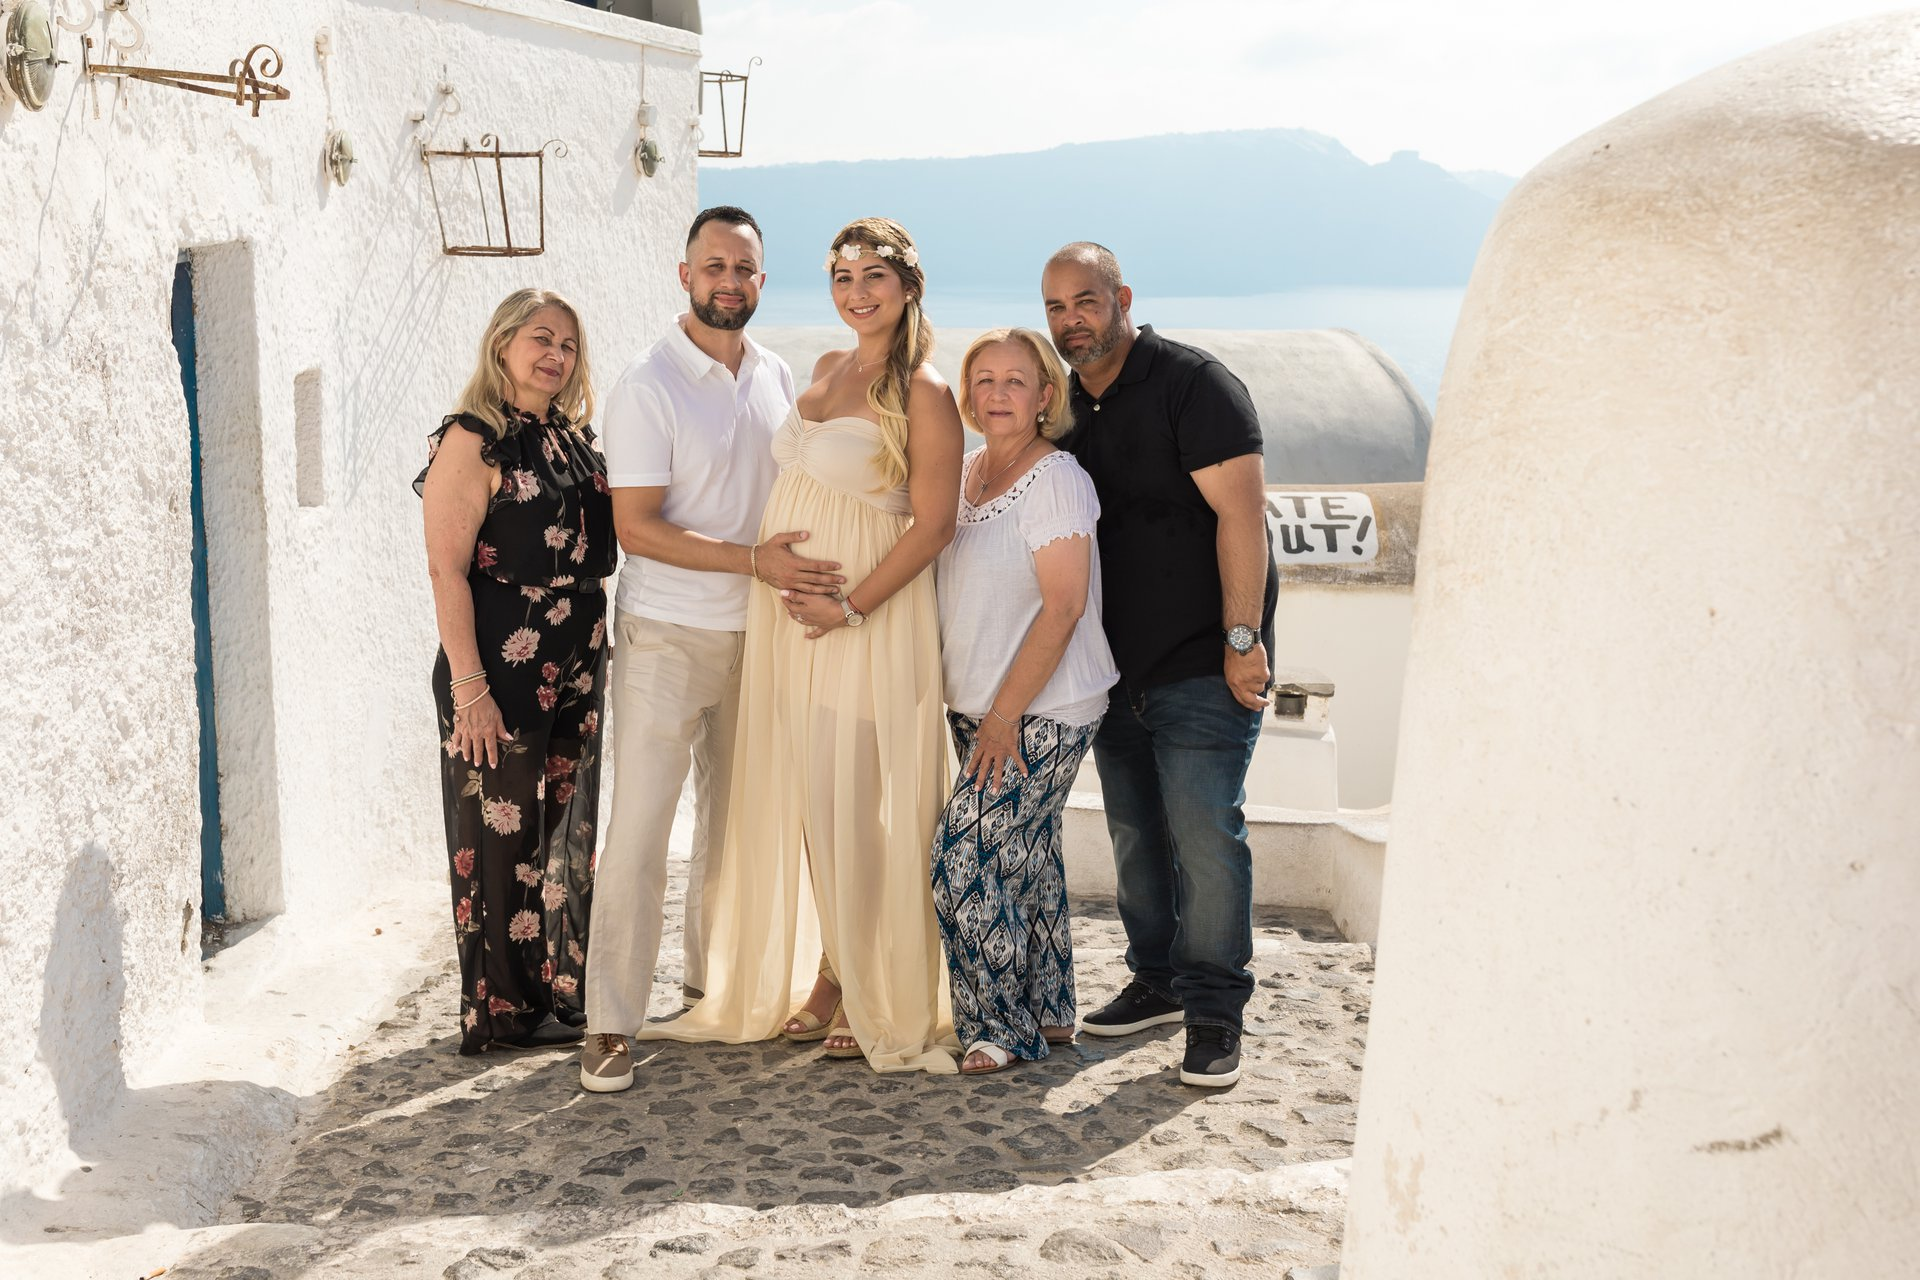 Santorini-Greece-travel-story-Flytographer-4